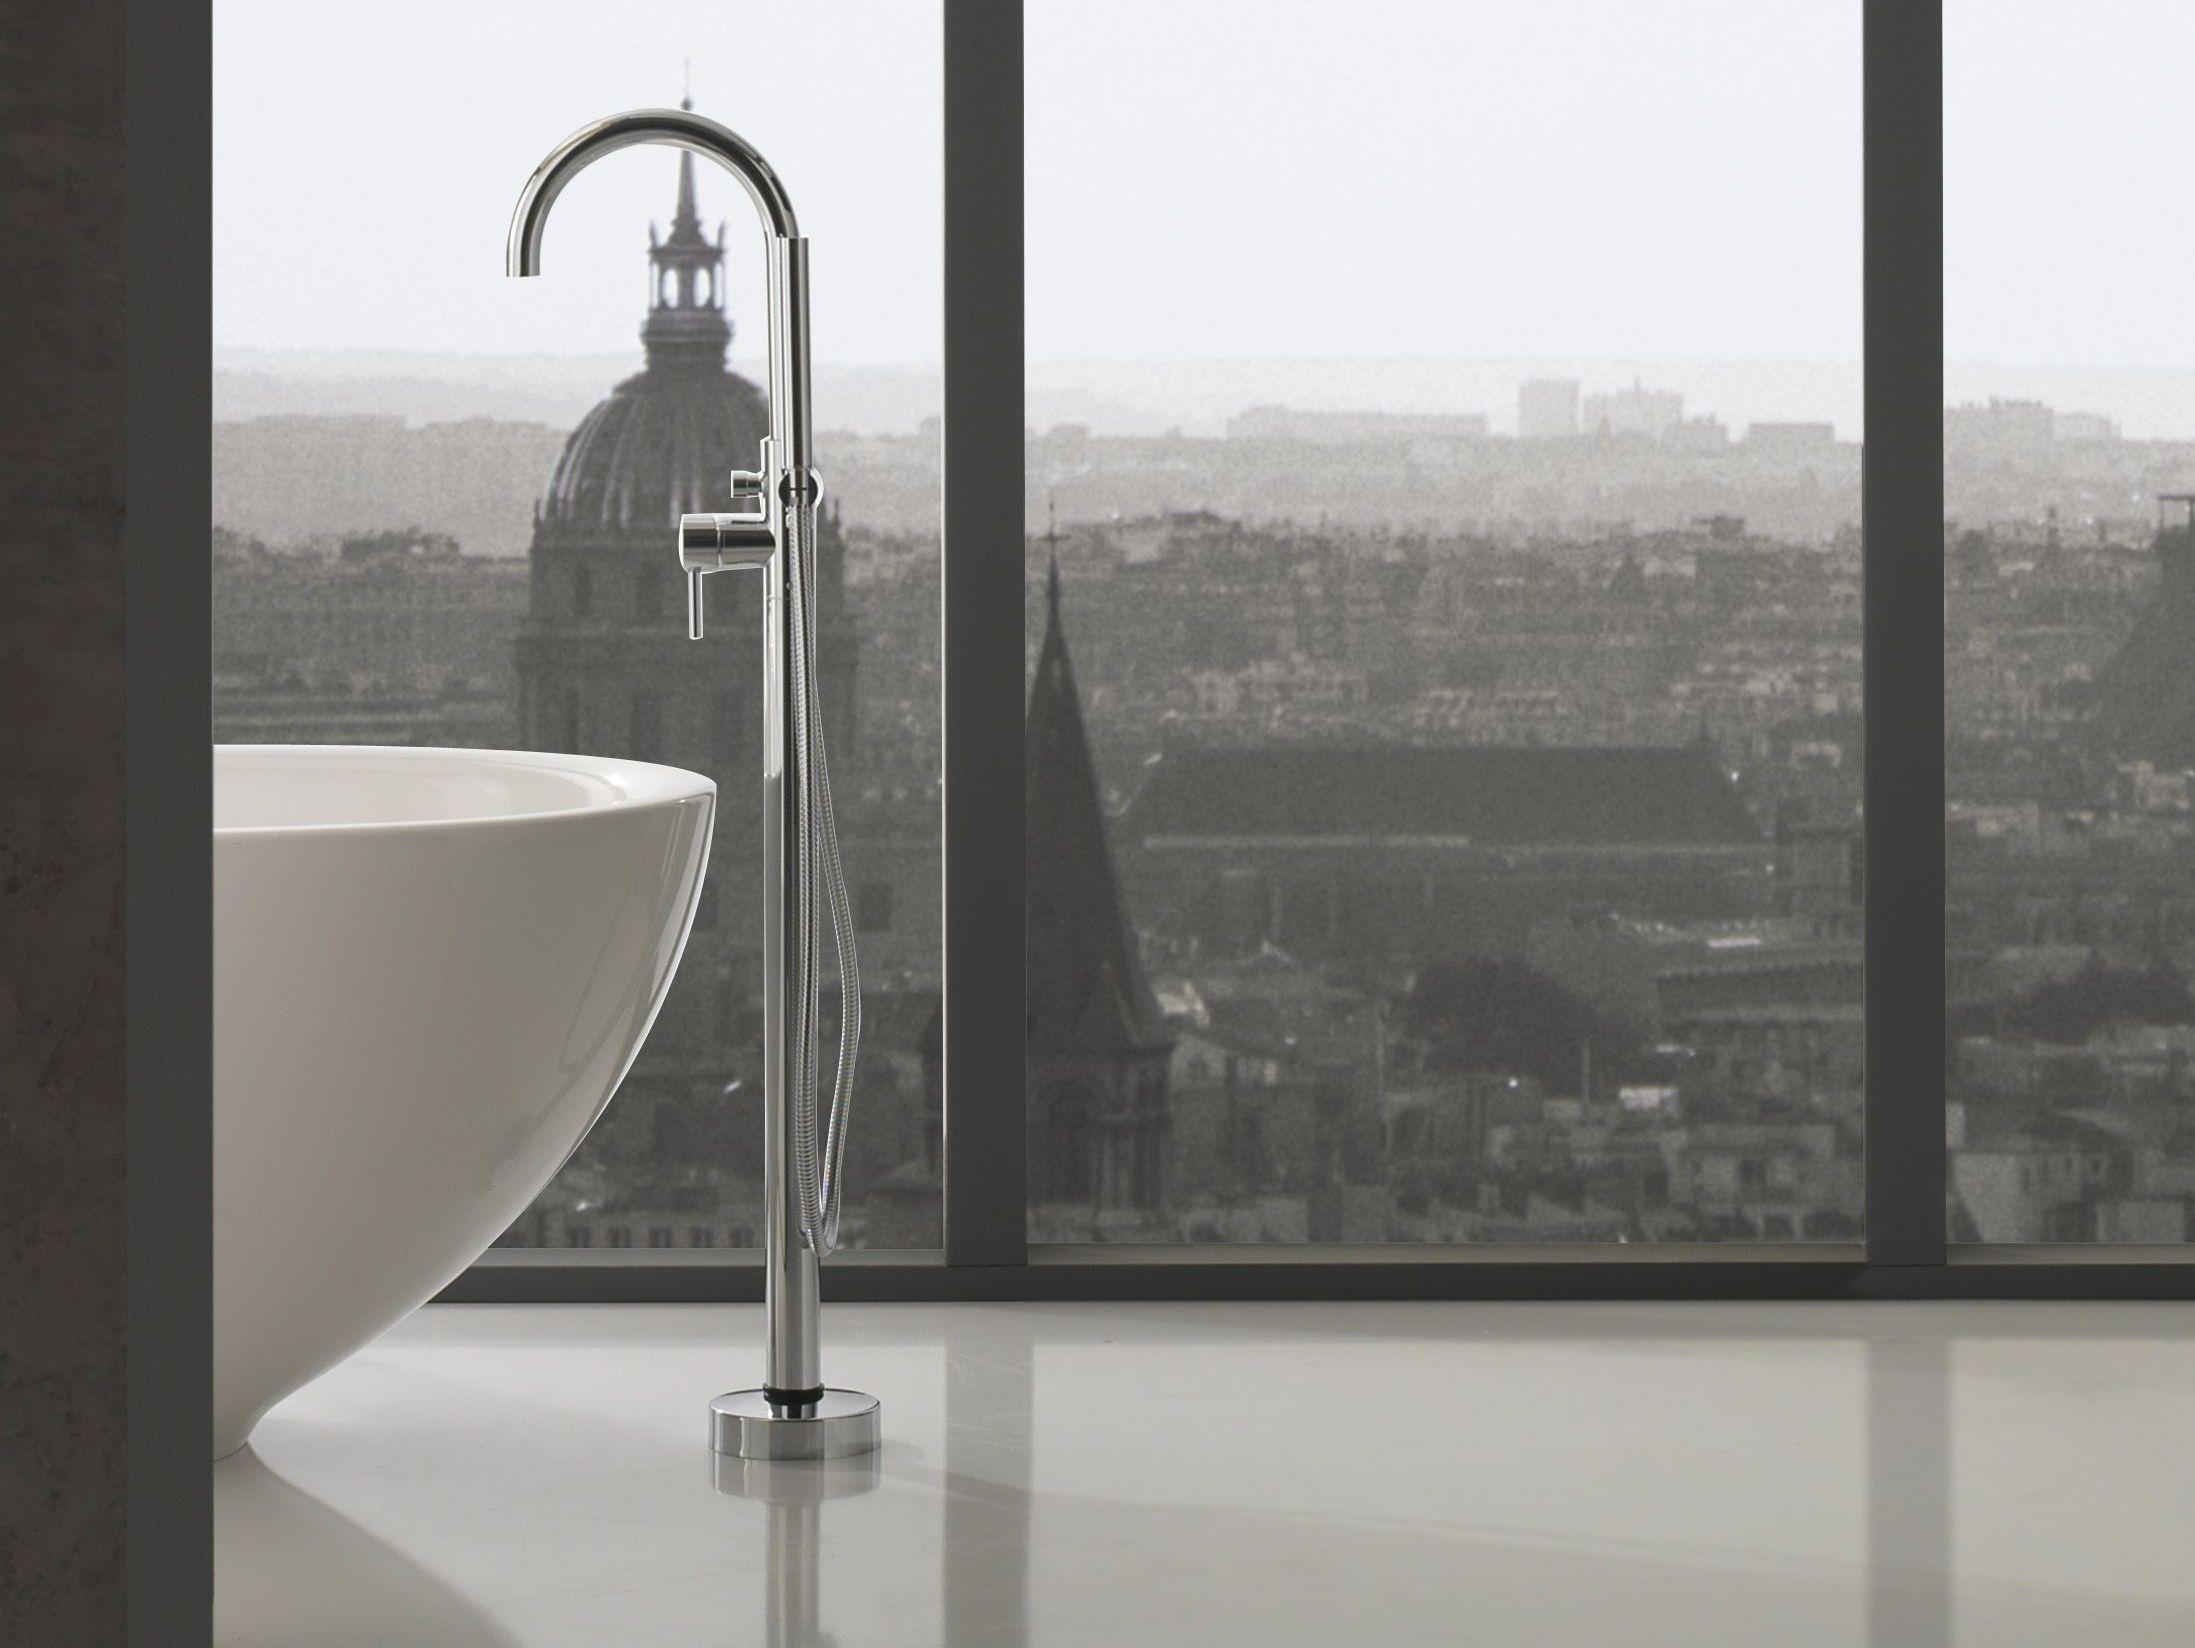 immersion | rubinetto per vasca da terra by graff europe west - Rubinetti Per Vasca Da Bagno